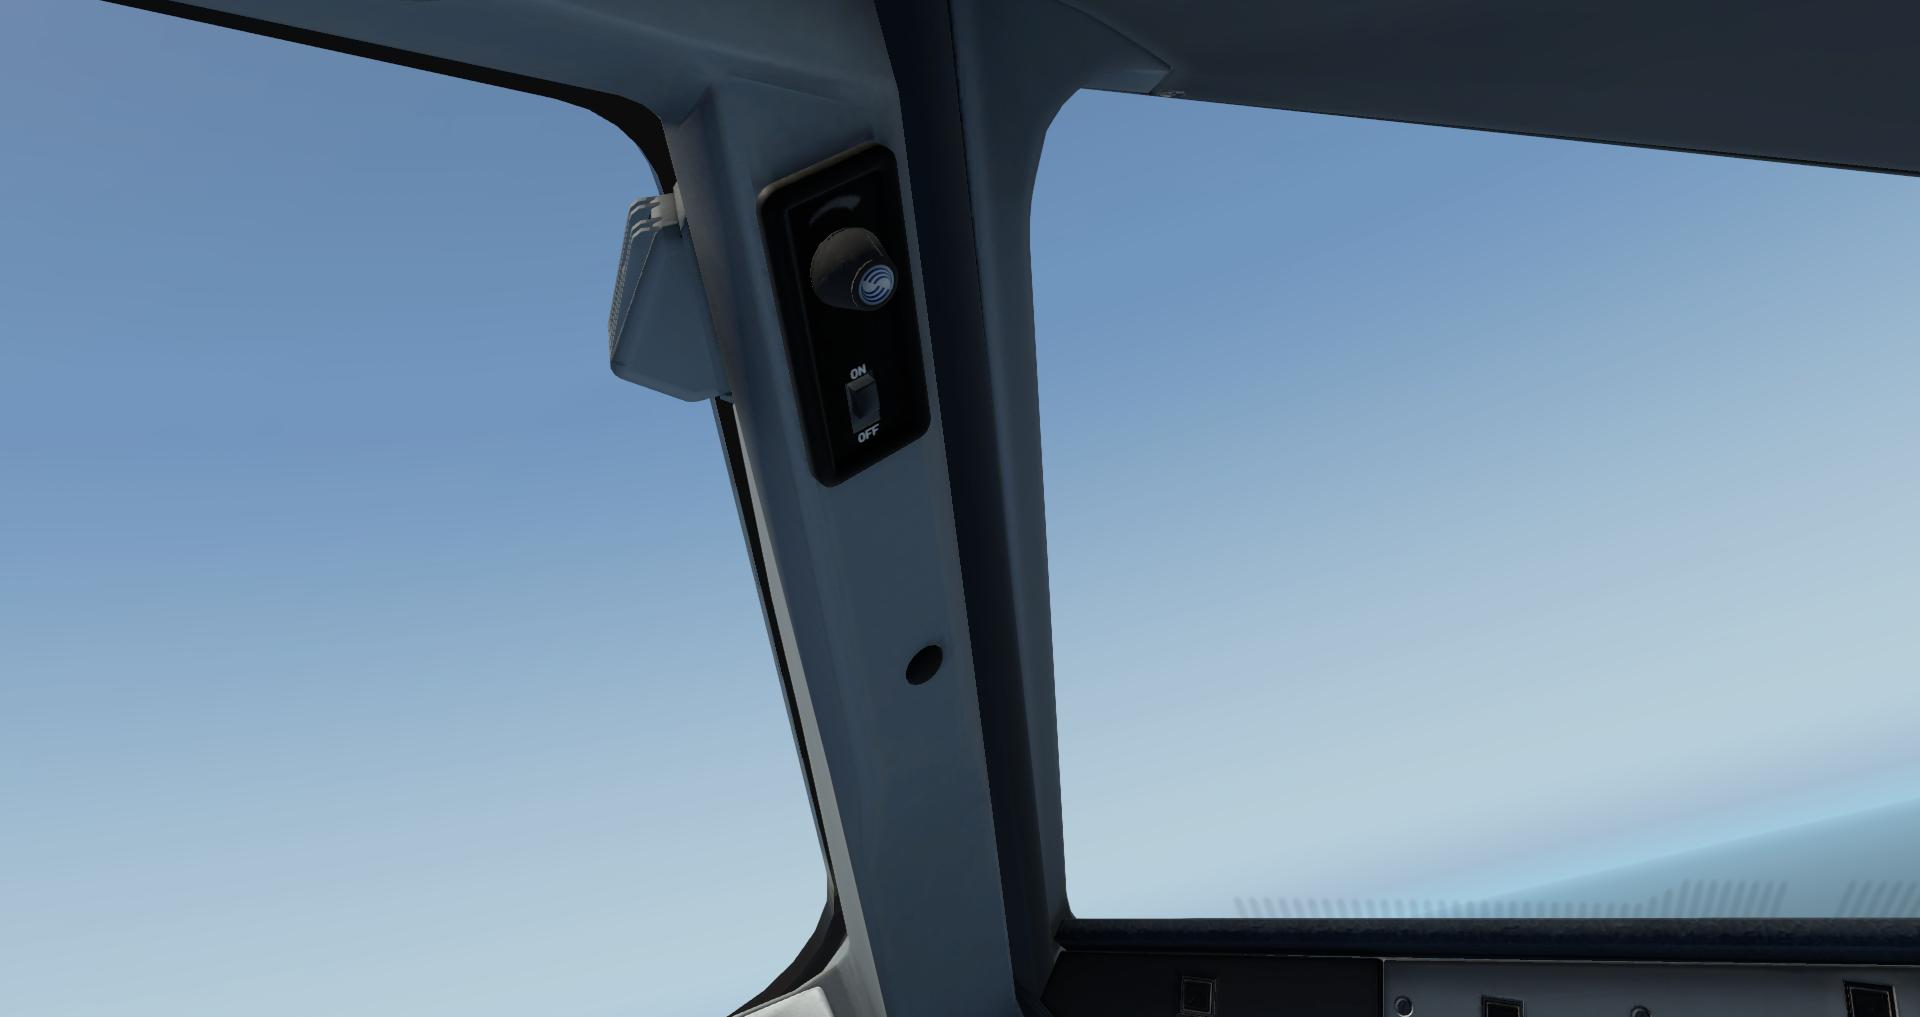 A320_1.png.8100506c160300d6197157b3a5e6c319.png